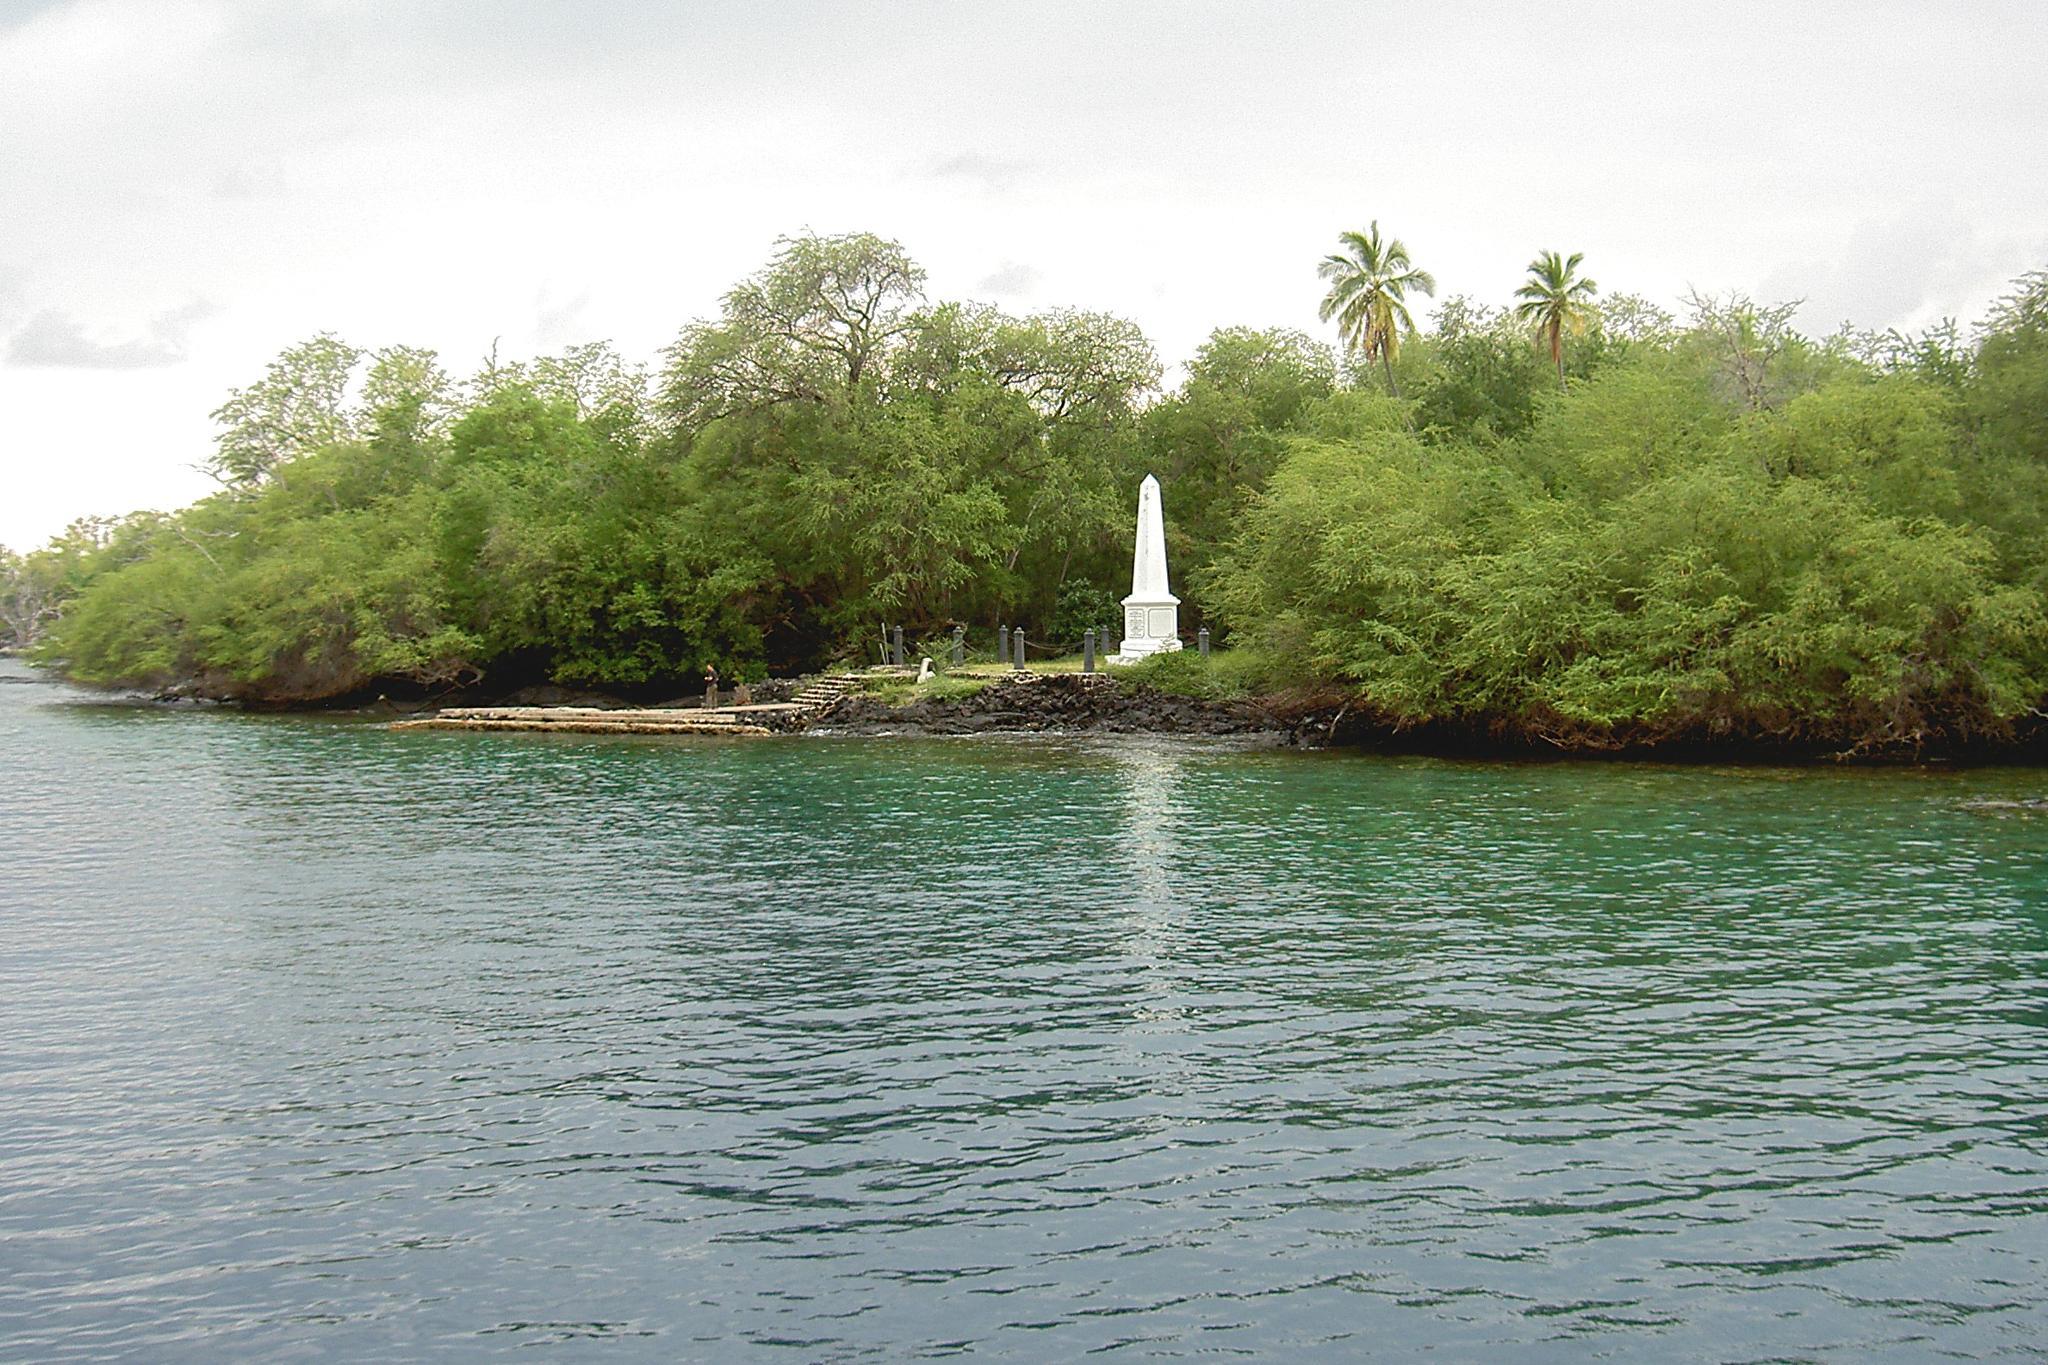 Captain Cook Monument by Terri Scache Harris